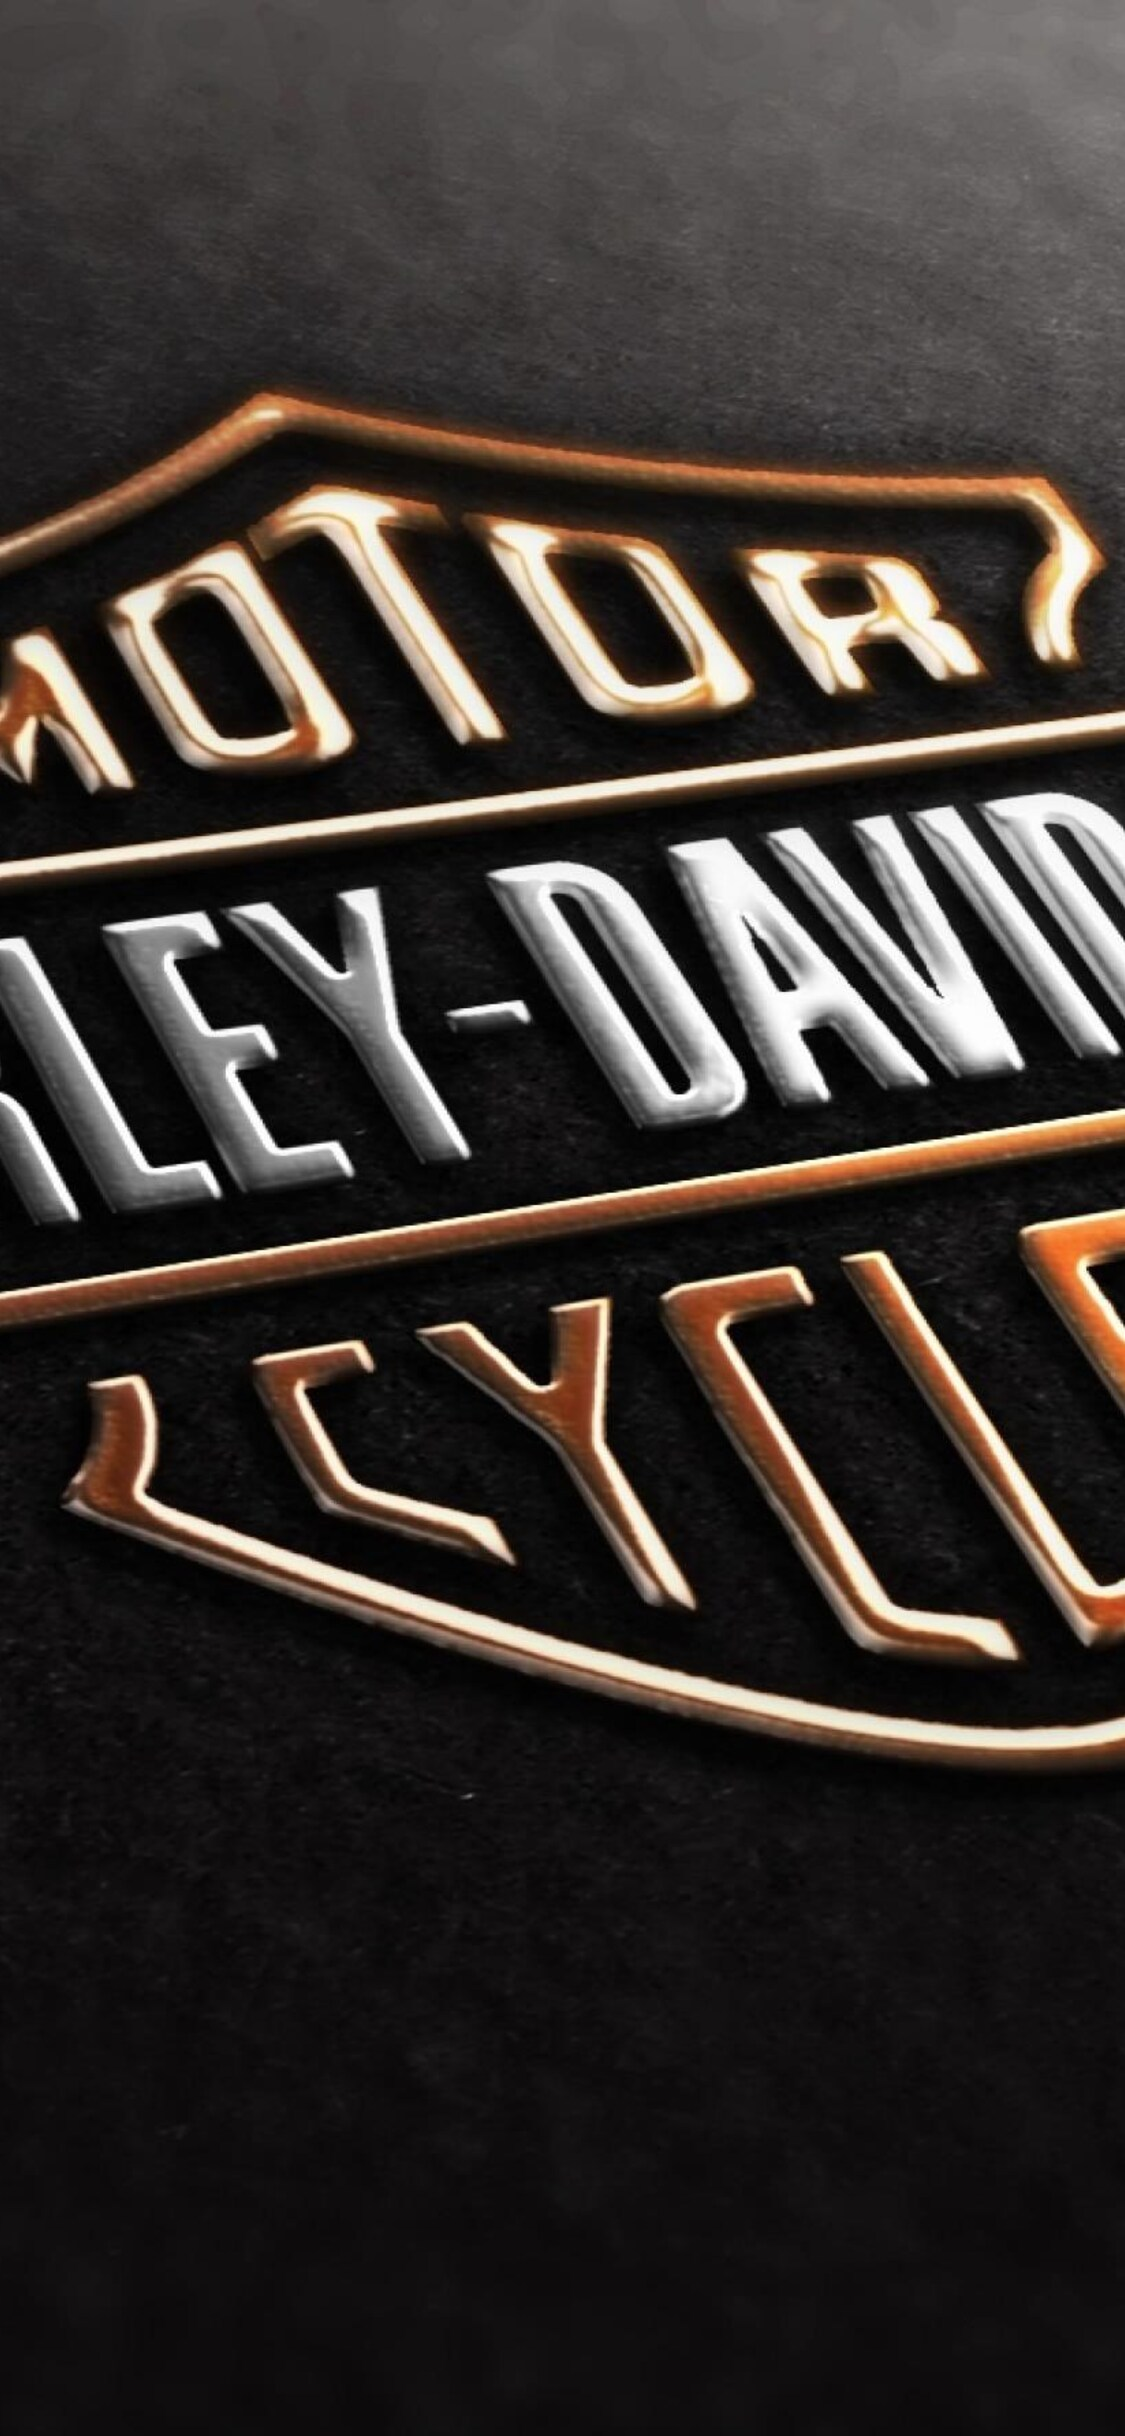 1125x2436 Harley Davidson Logo Iphone Xs Iphone 10 Iphone X